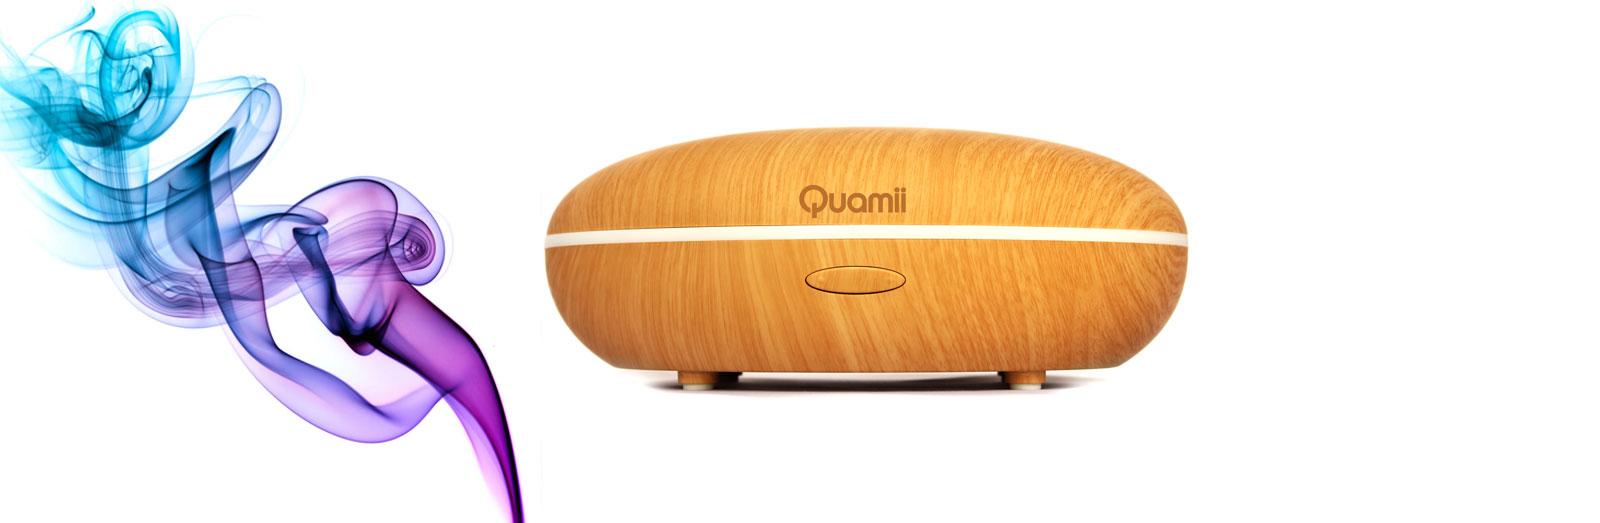 Quamii Ultrasonic Diffuser